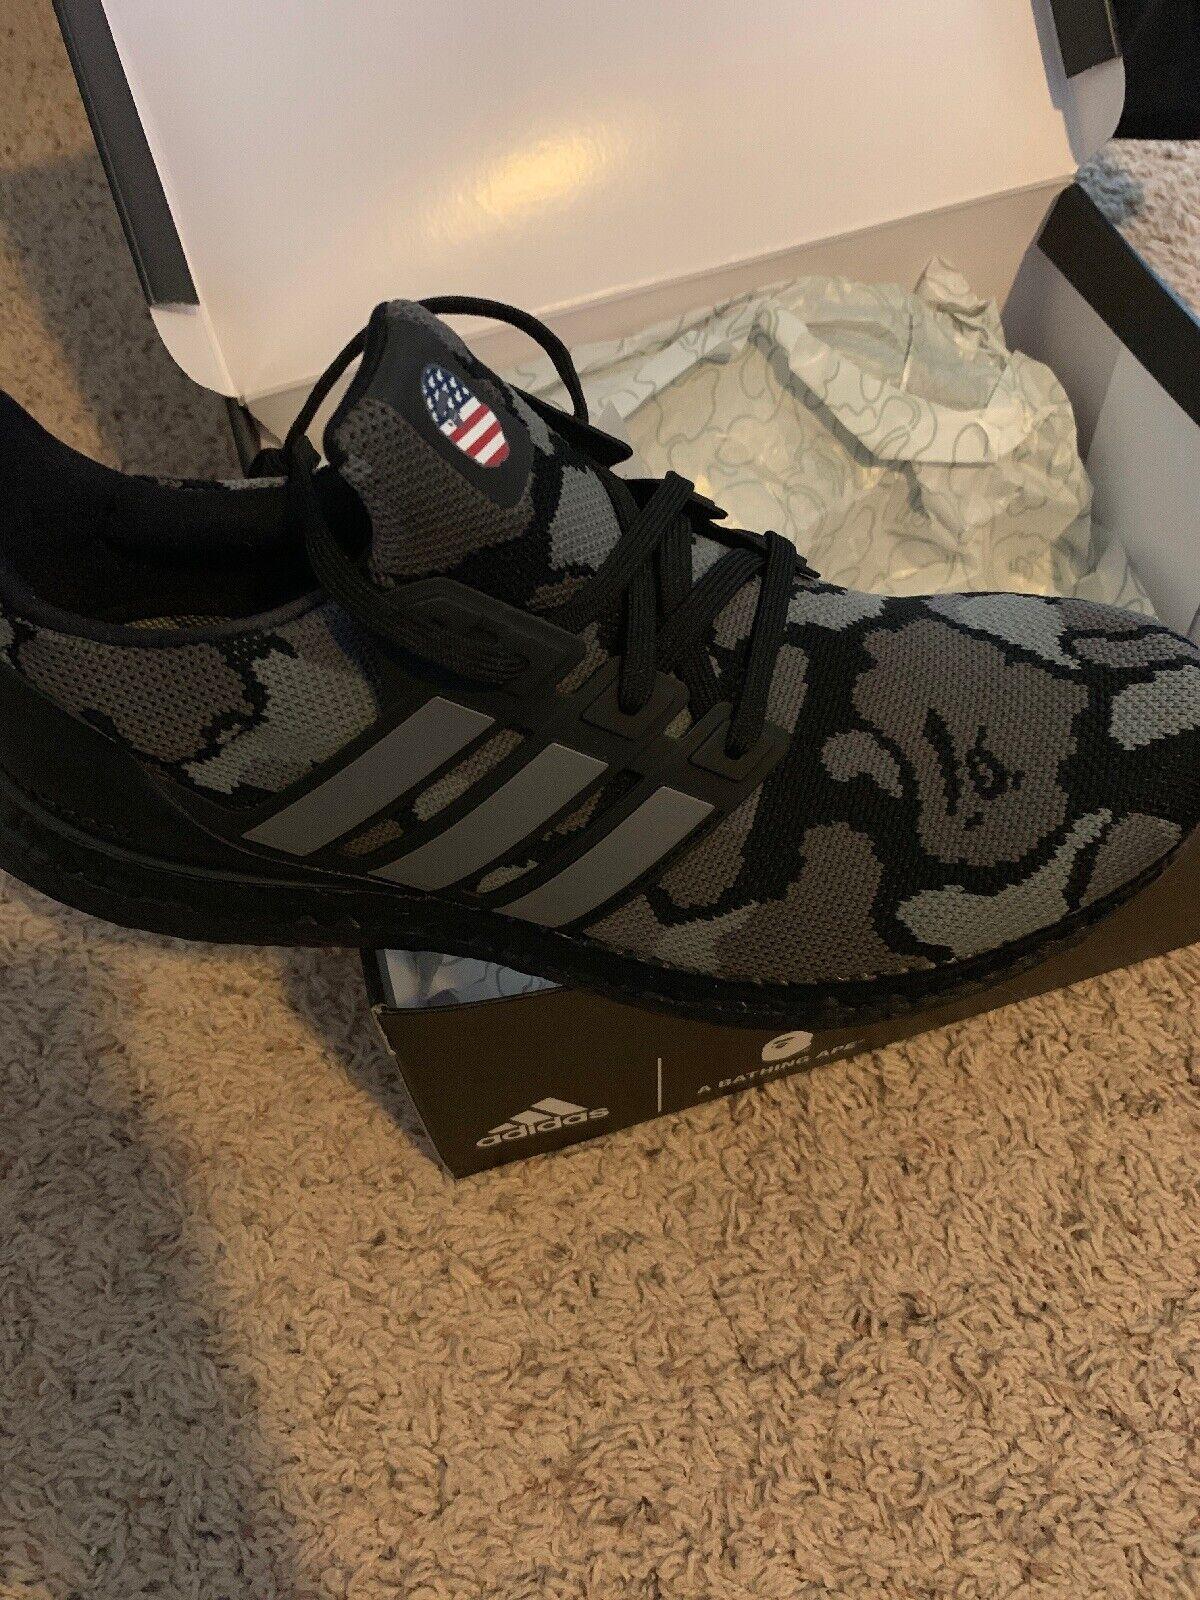 Adidas ultra boost 4.0 bape camo